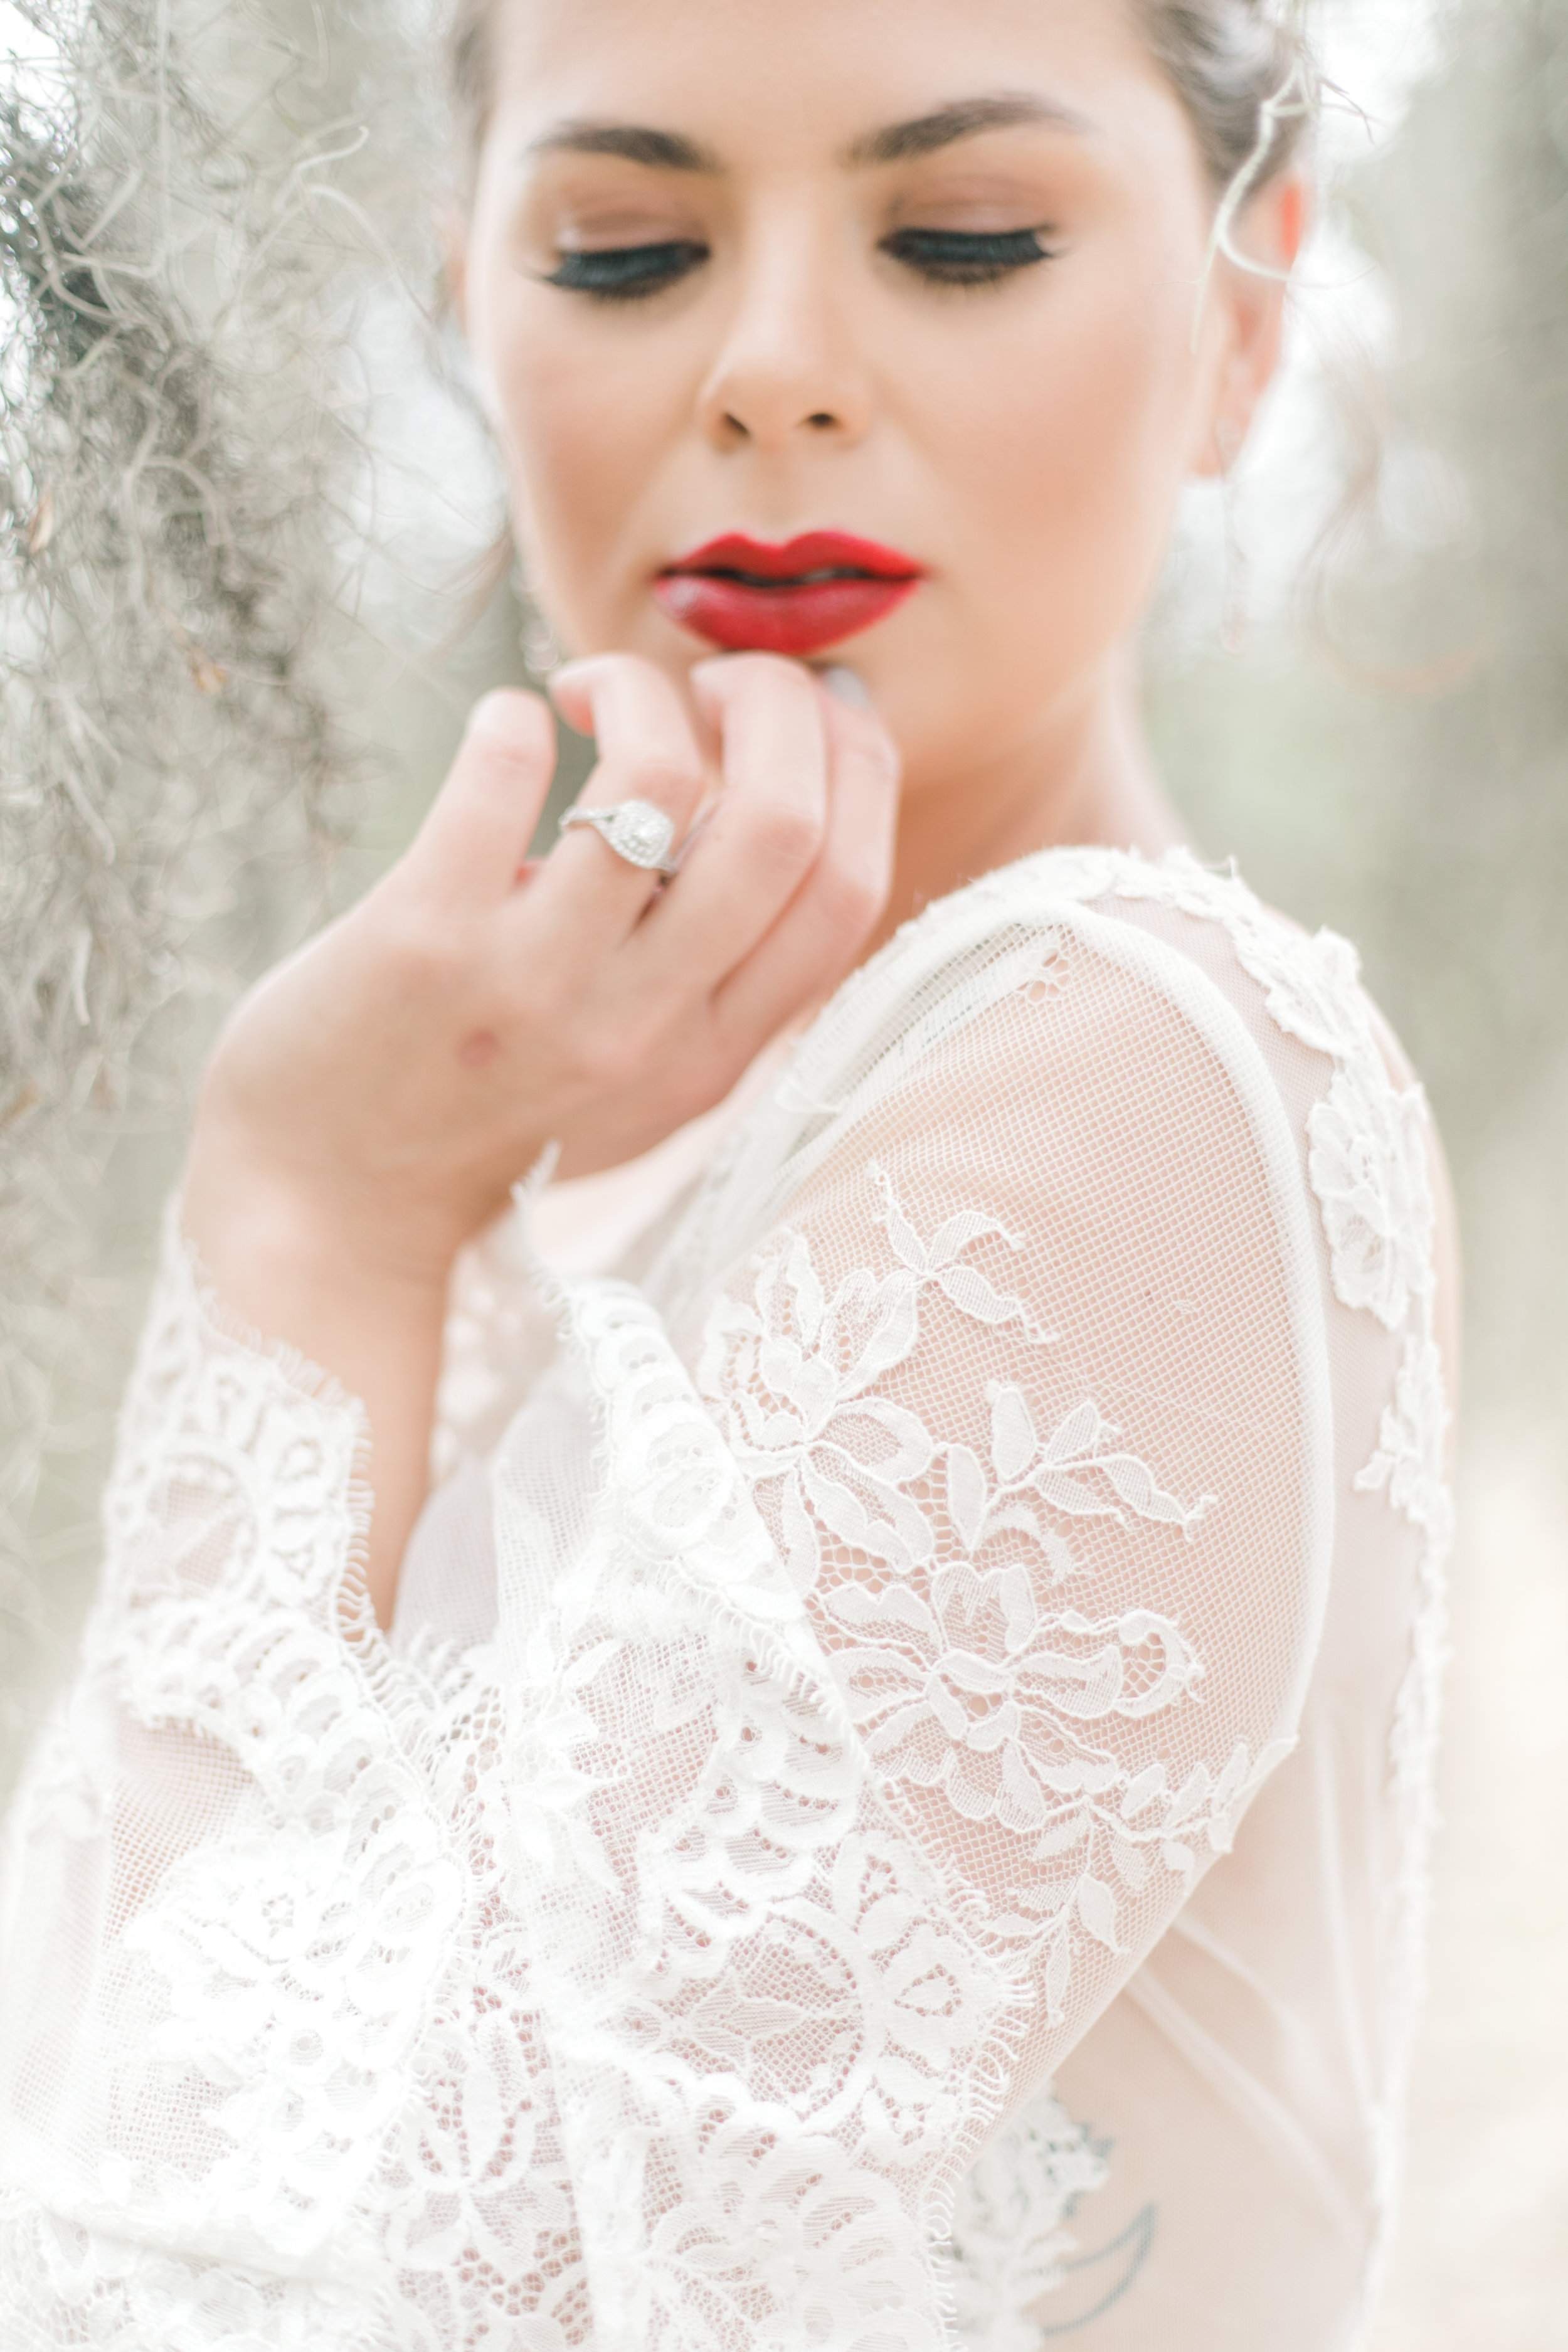 red-lipstick-bridal-makeup-inspiration-wormsloe-elopement-long-sleeve-lamour-by-calla-blanche-amber-wedding-dress.jpg